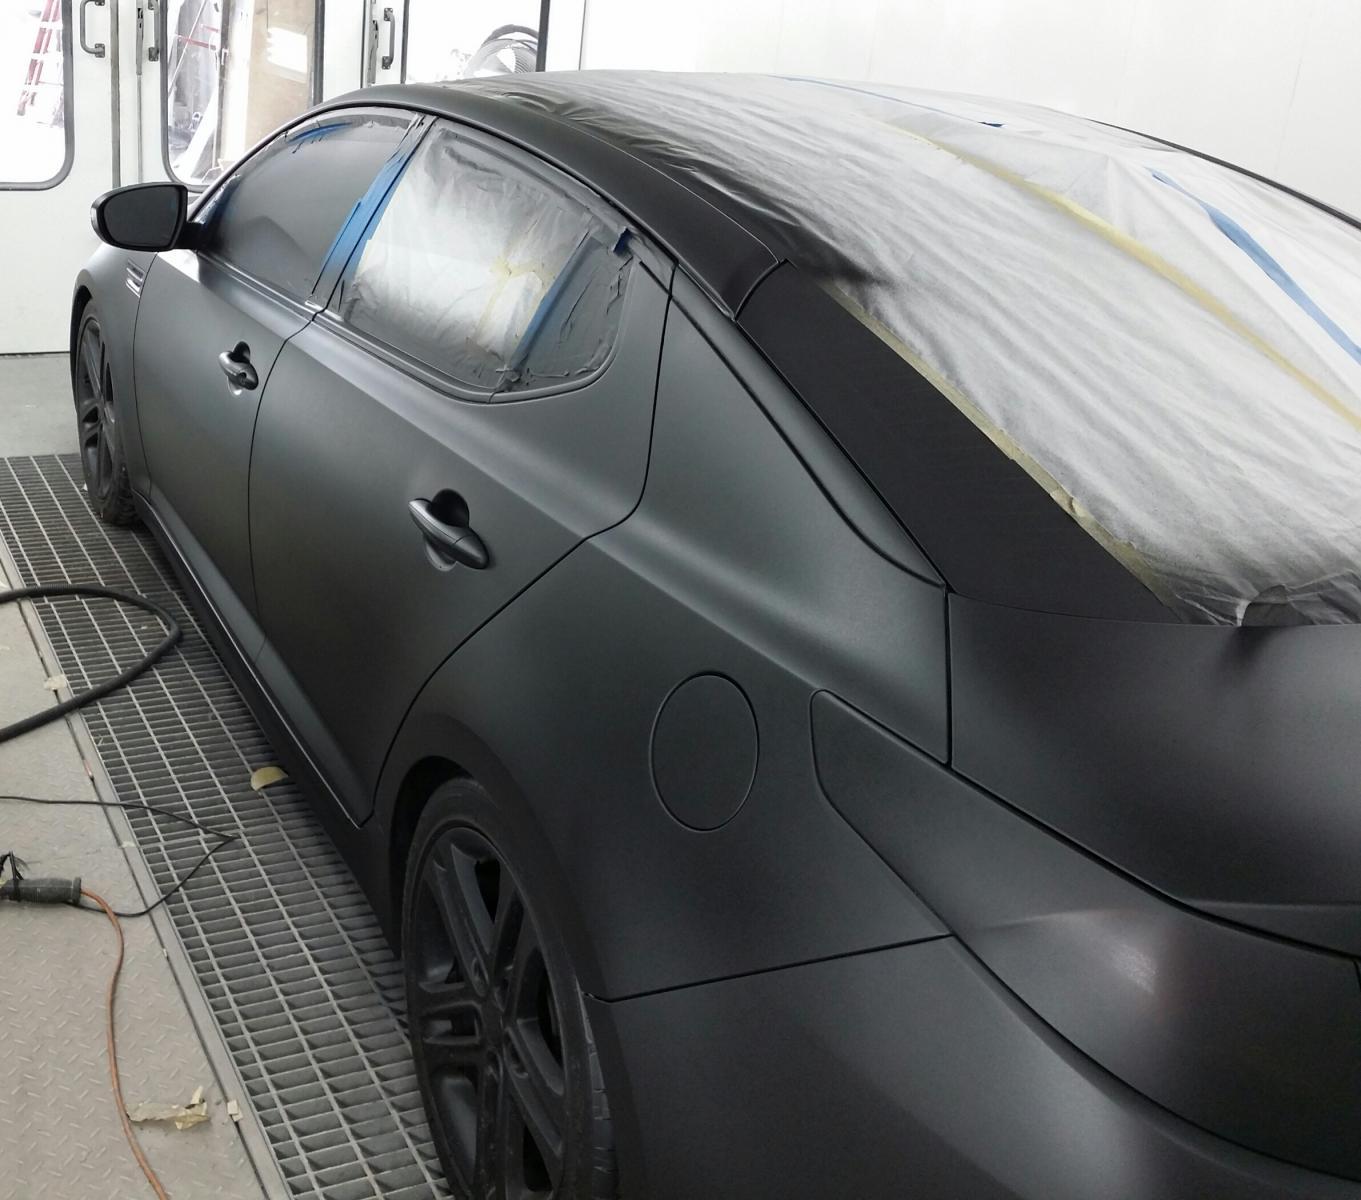 Plasti Dip Whole Car